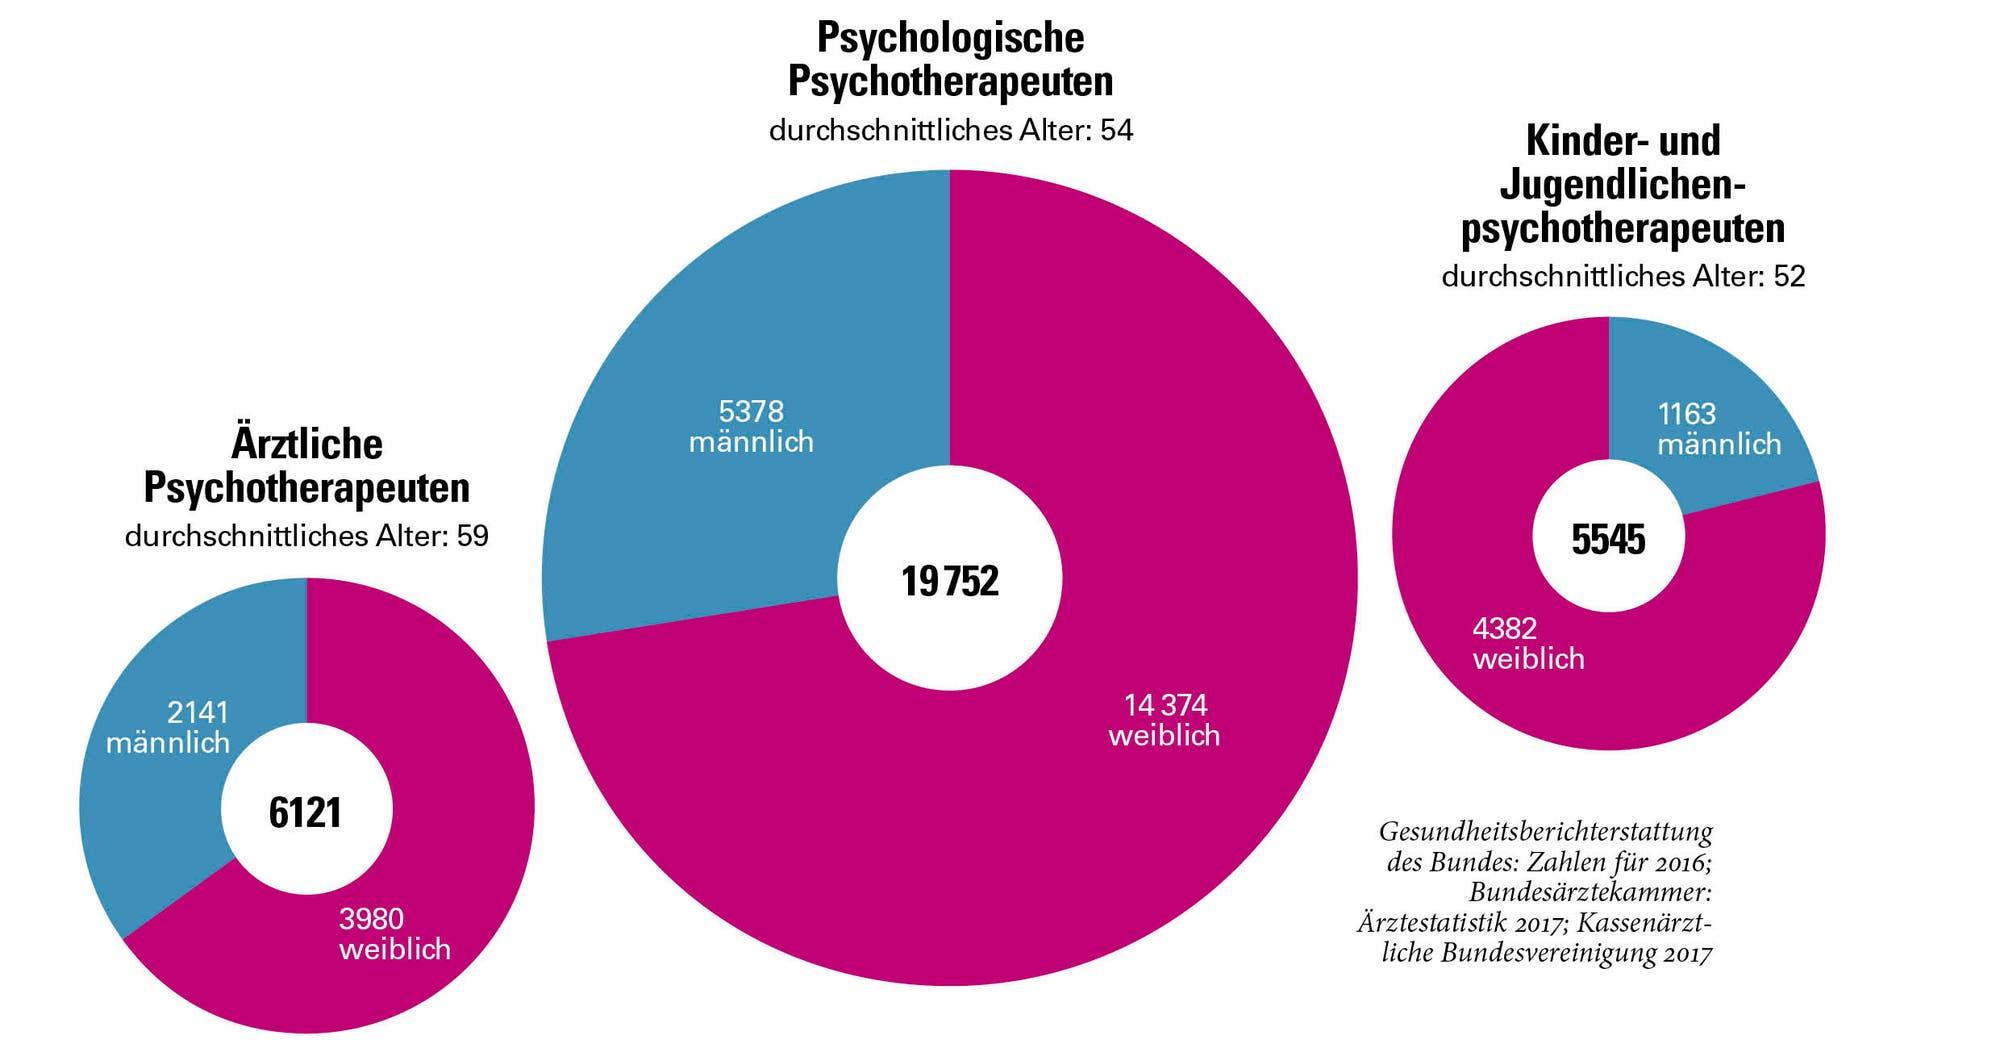 Psychotherapeuten in Deutschland